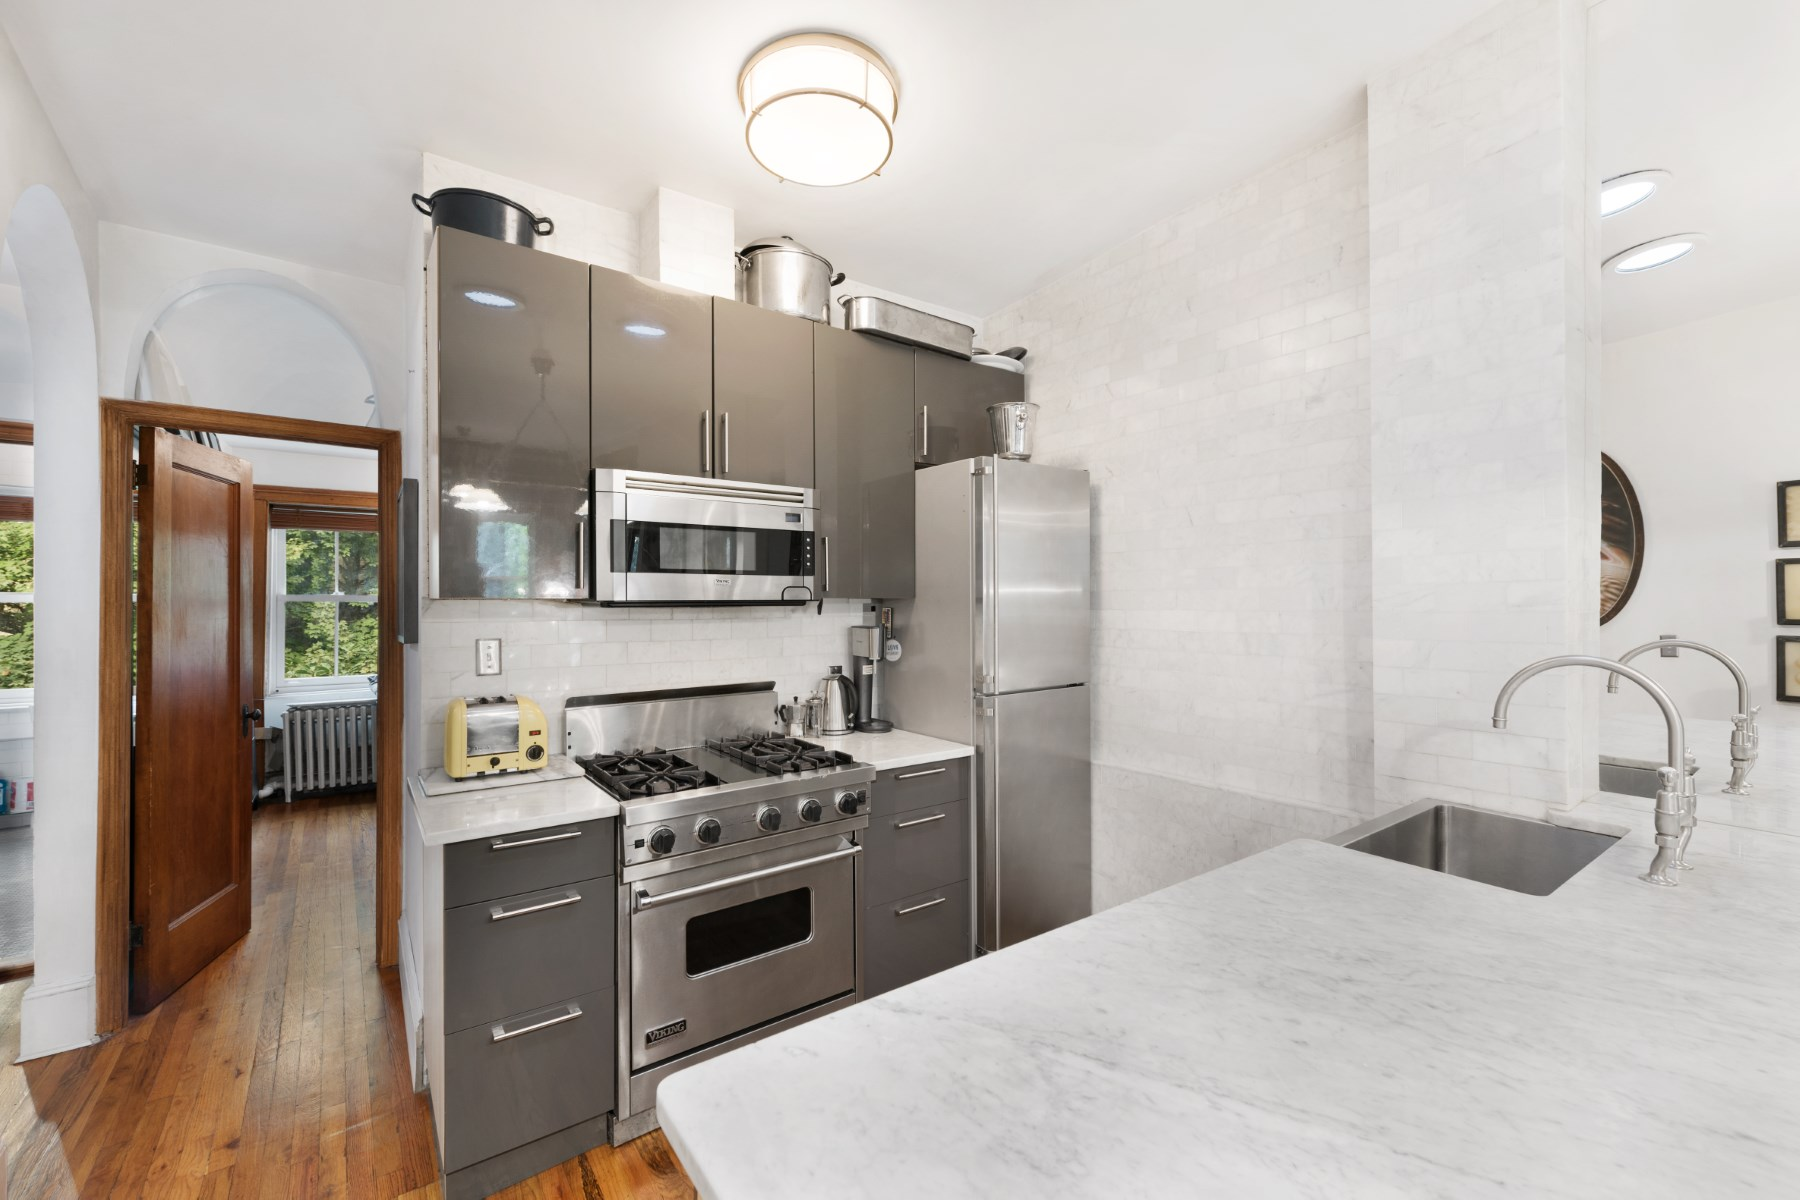 Property Of 247 East 49th Street, Apt. 4